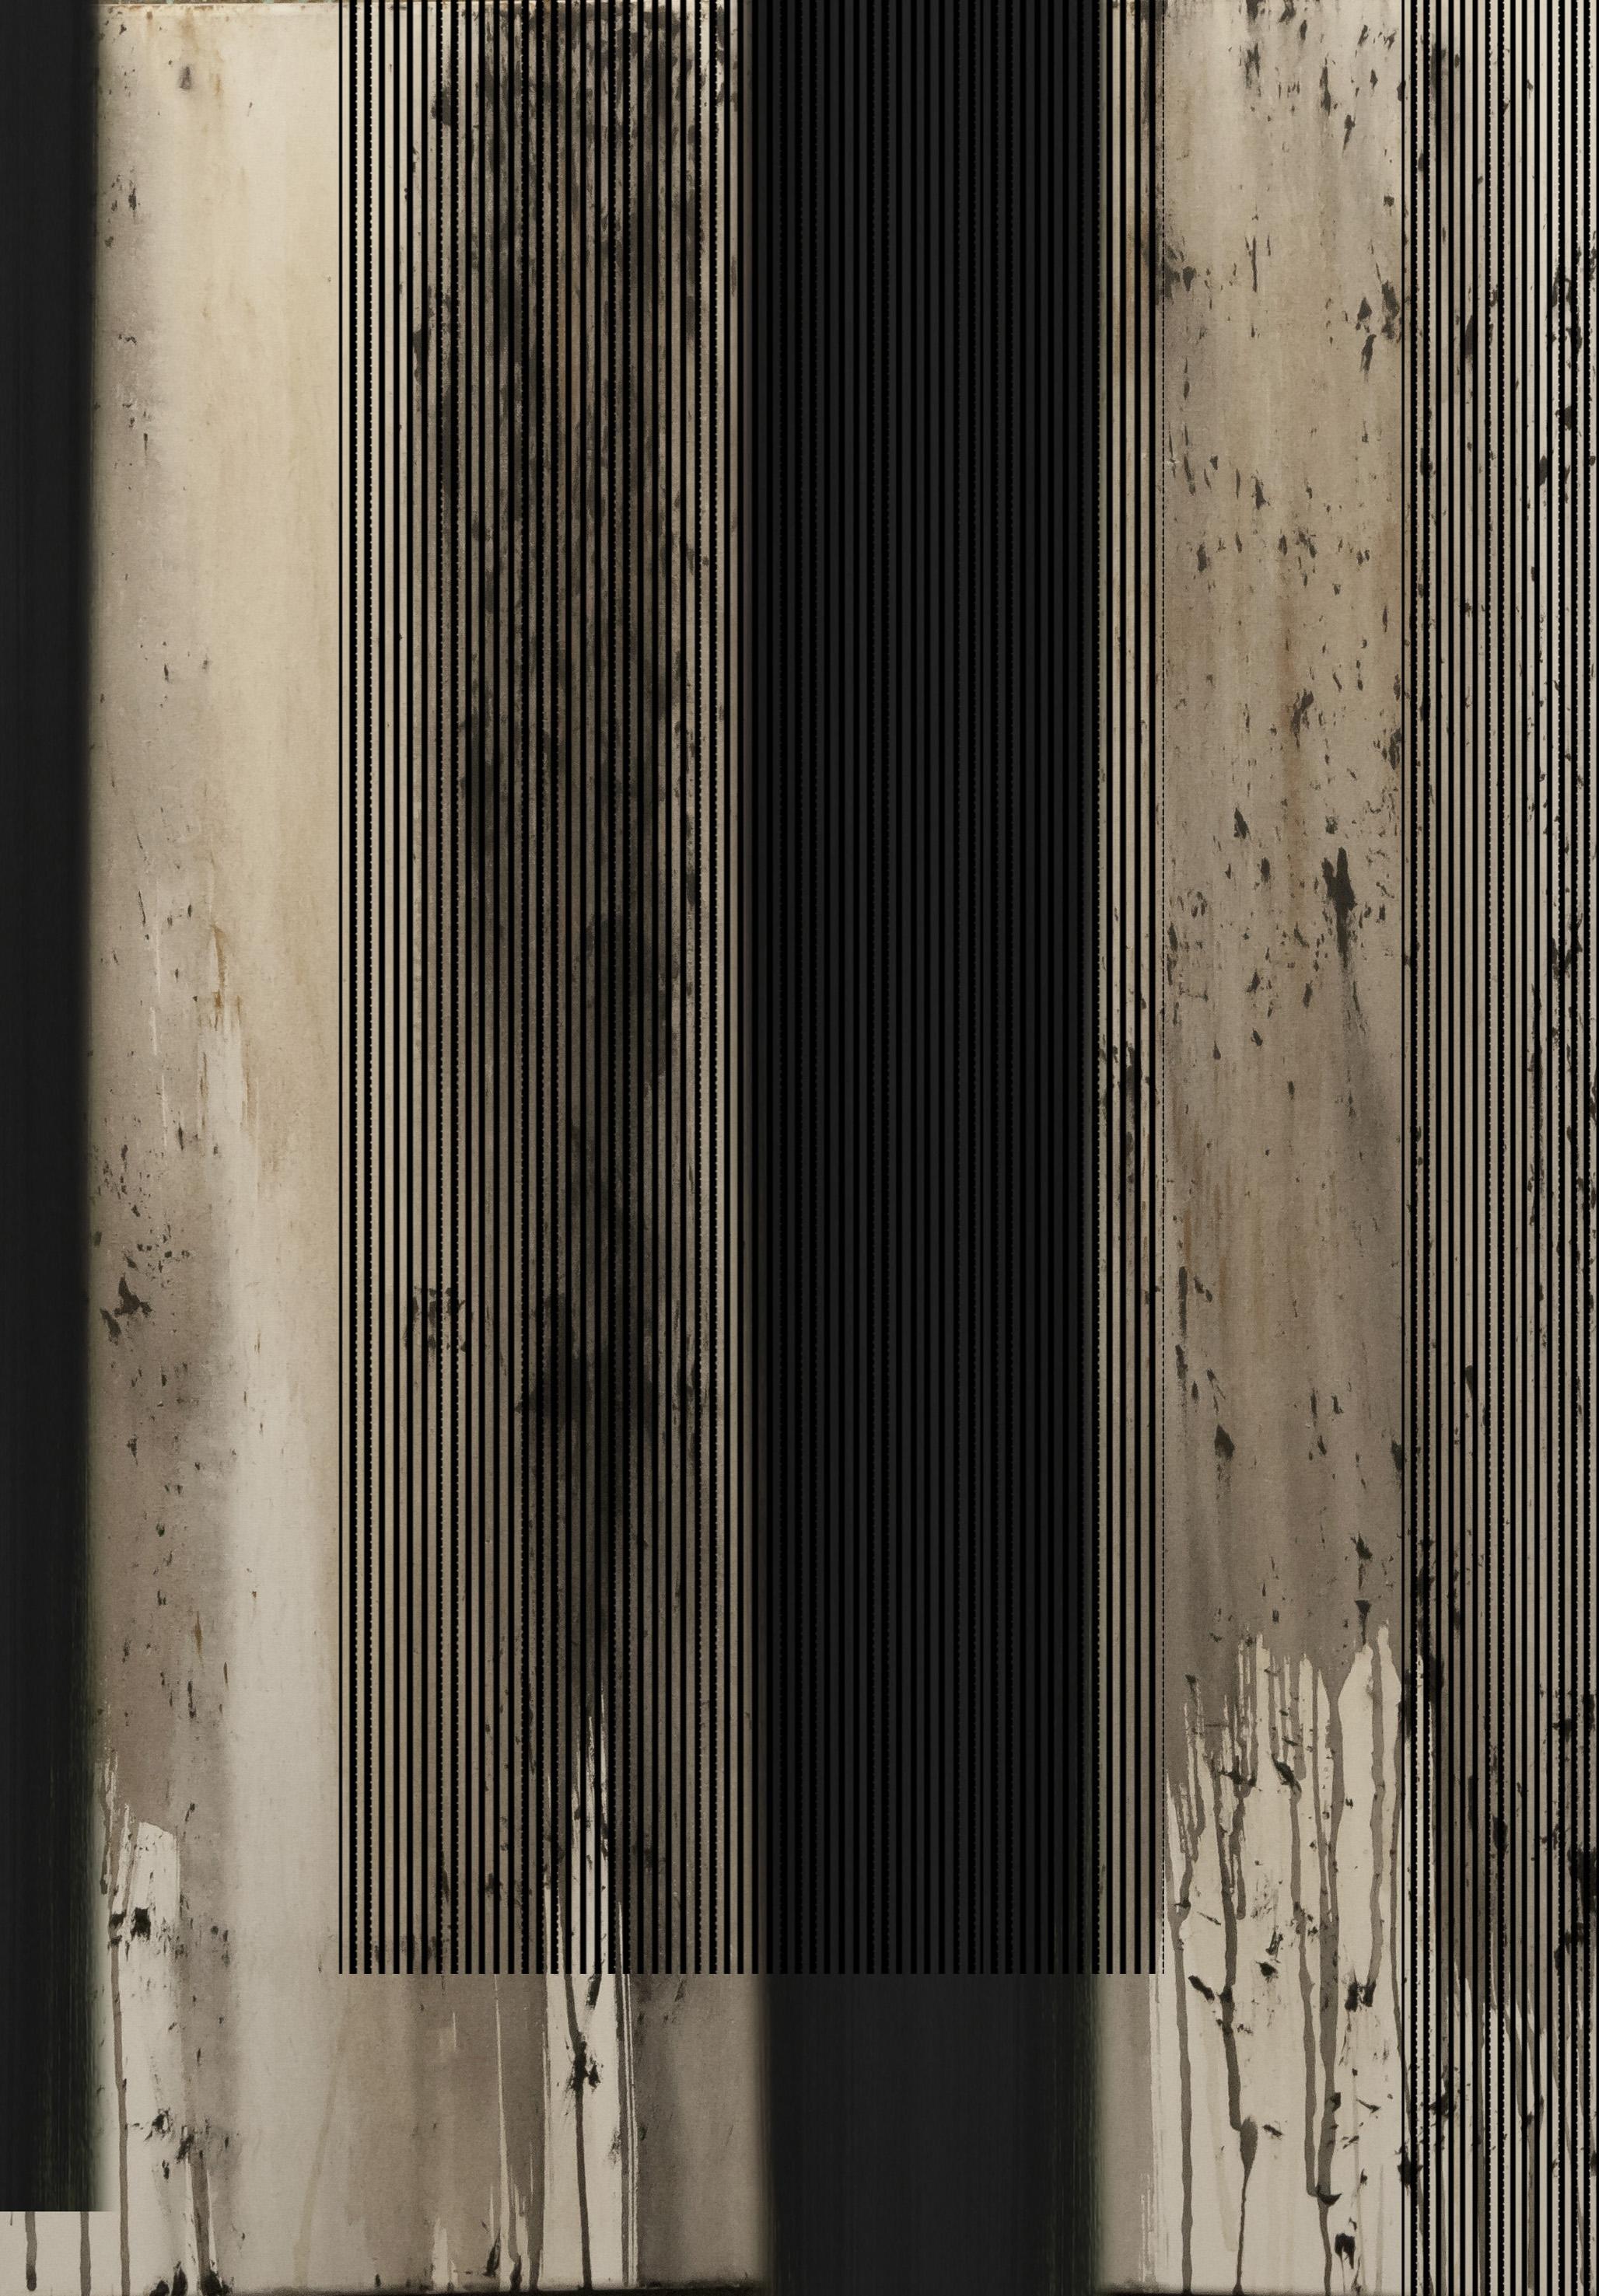 3 Herbert Egger –TRANSIT II-2015-70 x 100 cm-acrylic on canvas.jpg